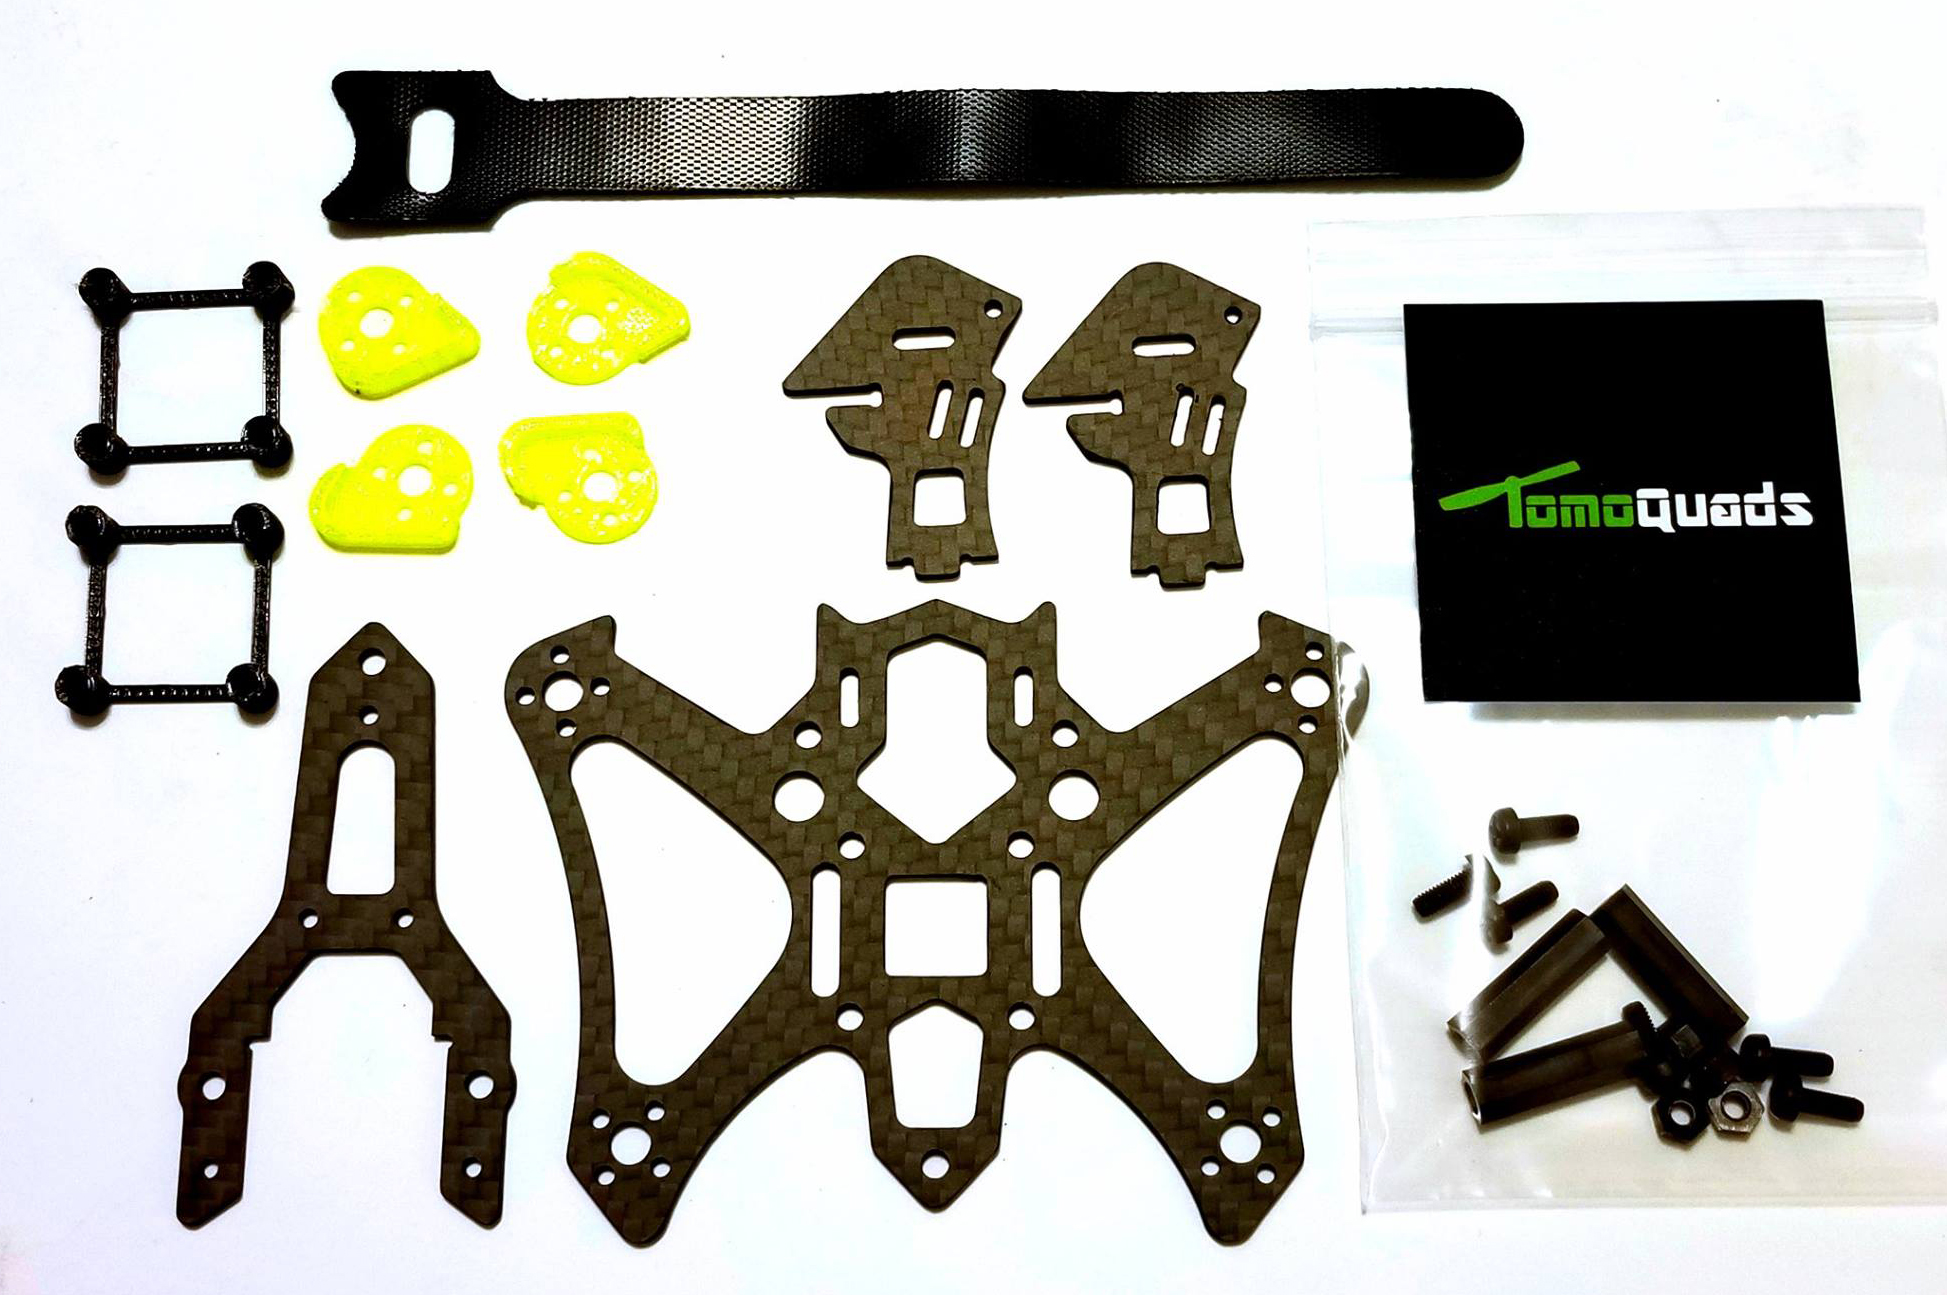 Tomoquads X Fighter Helicomicro Com